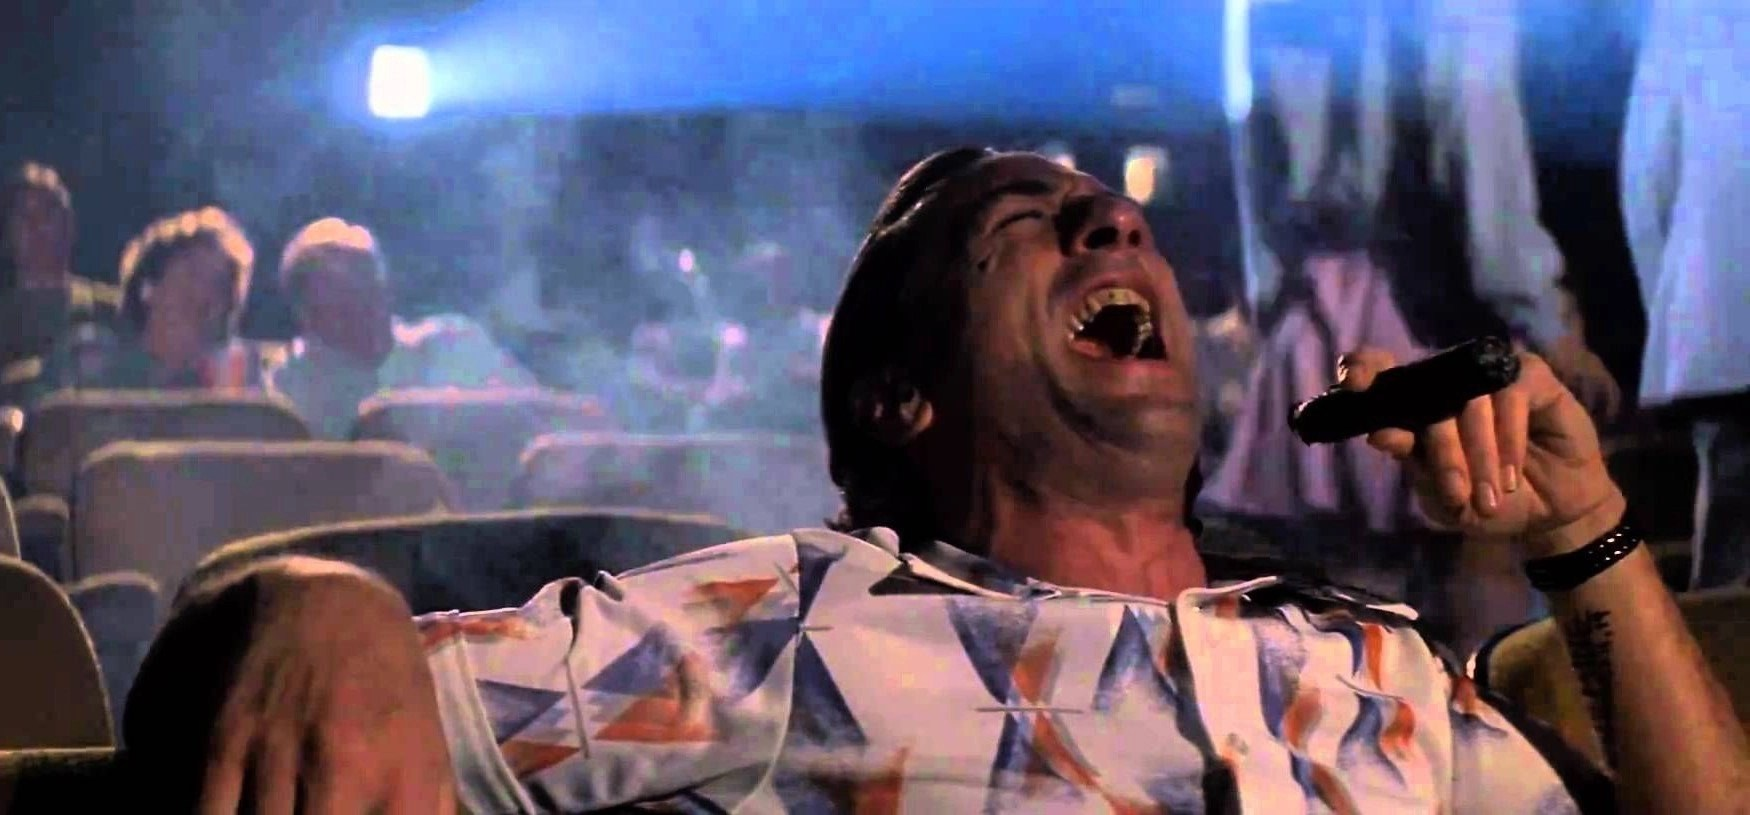 Robert De Niro, Juliette Lewis, and Nick Nolte in Cape Fear (1991)2